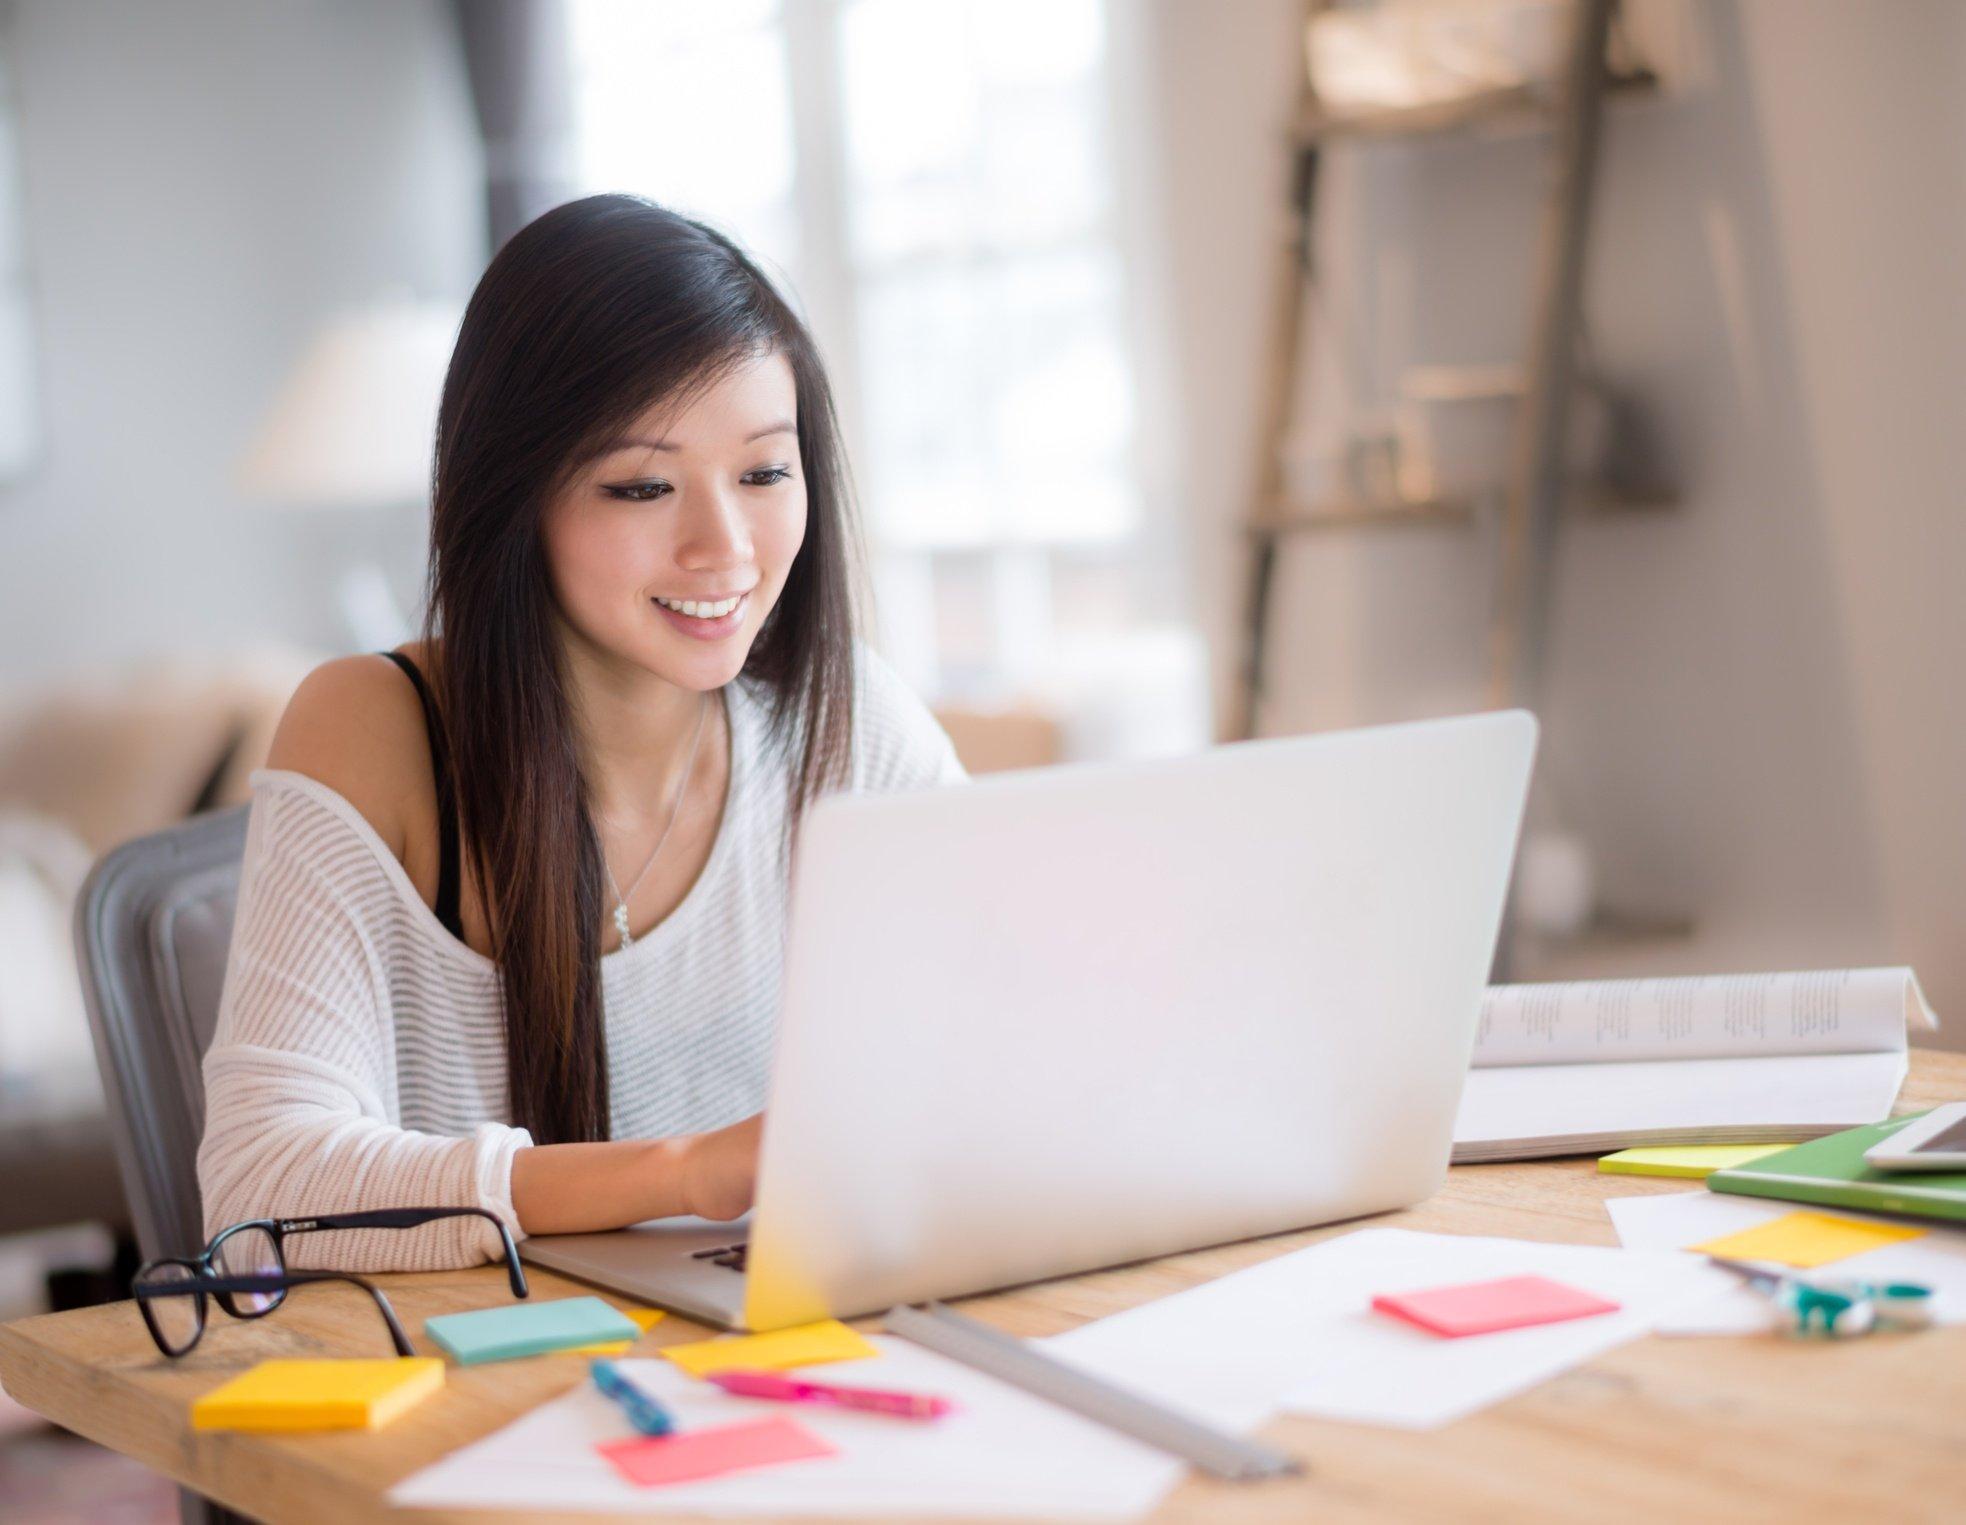 10 NEW Undergraduate Programs Now Offered at Neumann University